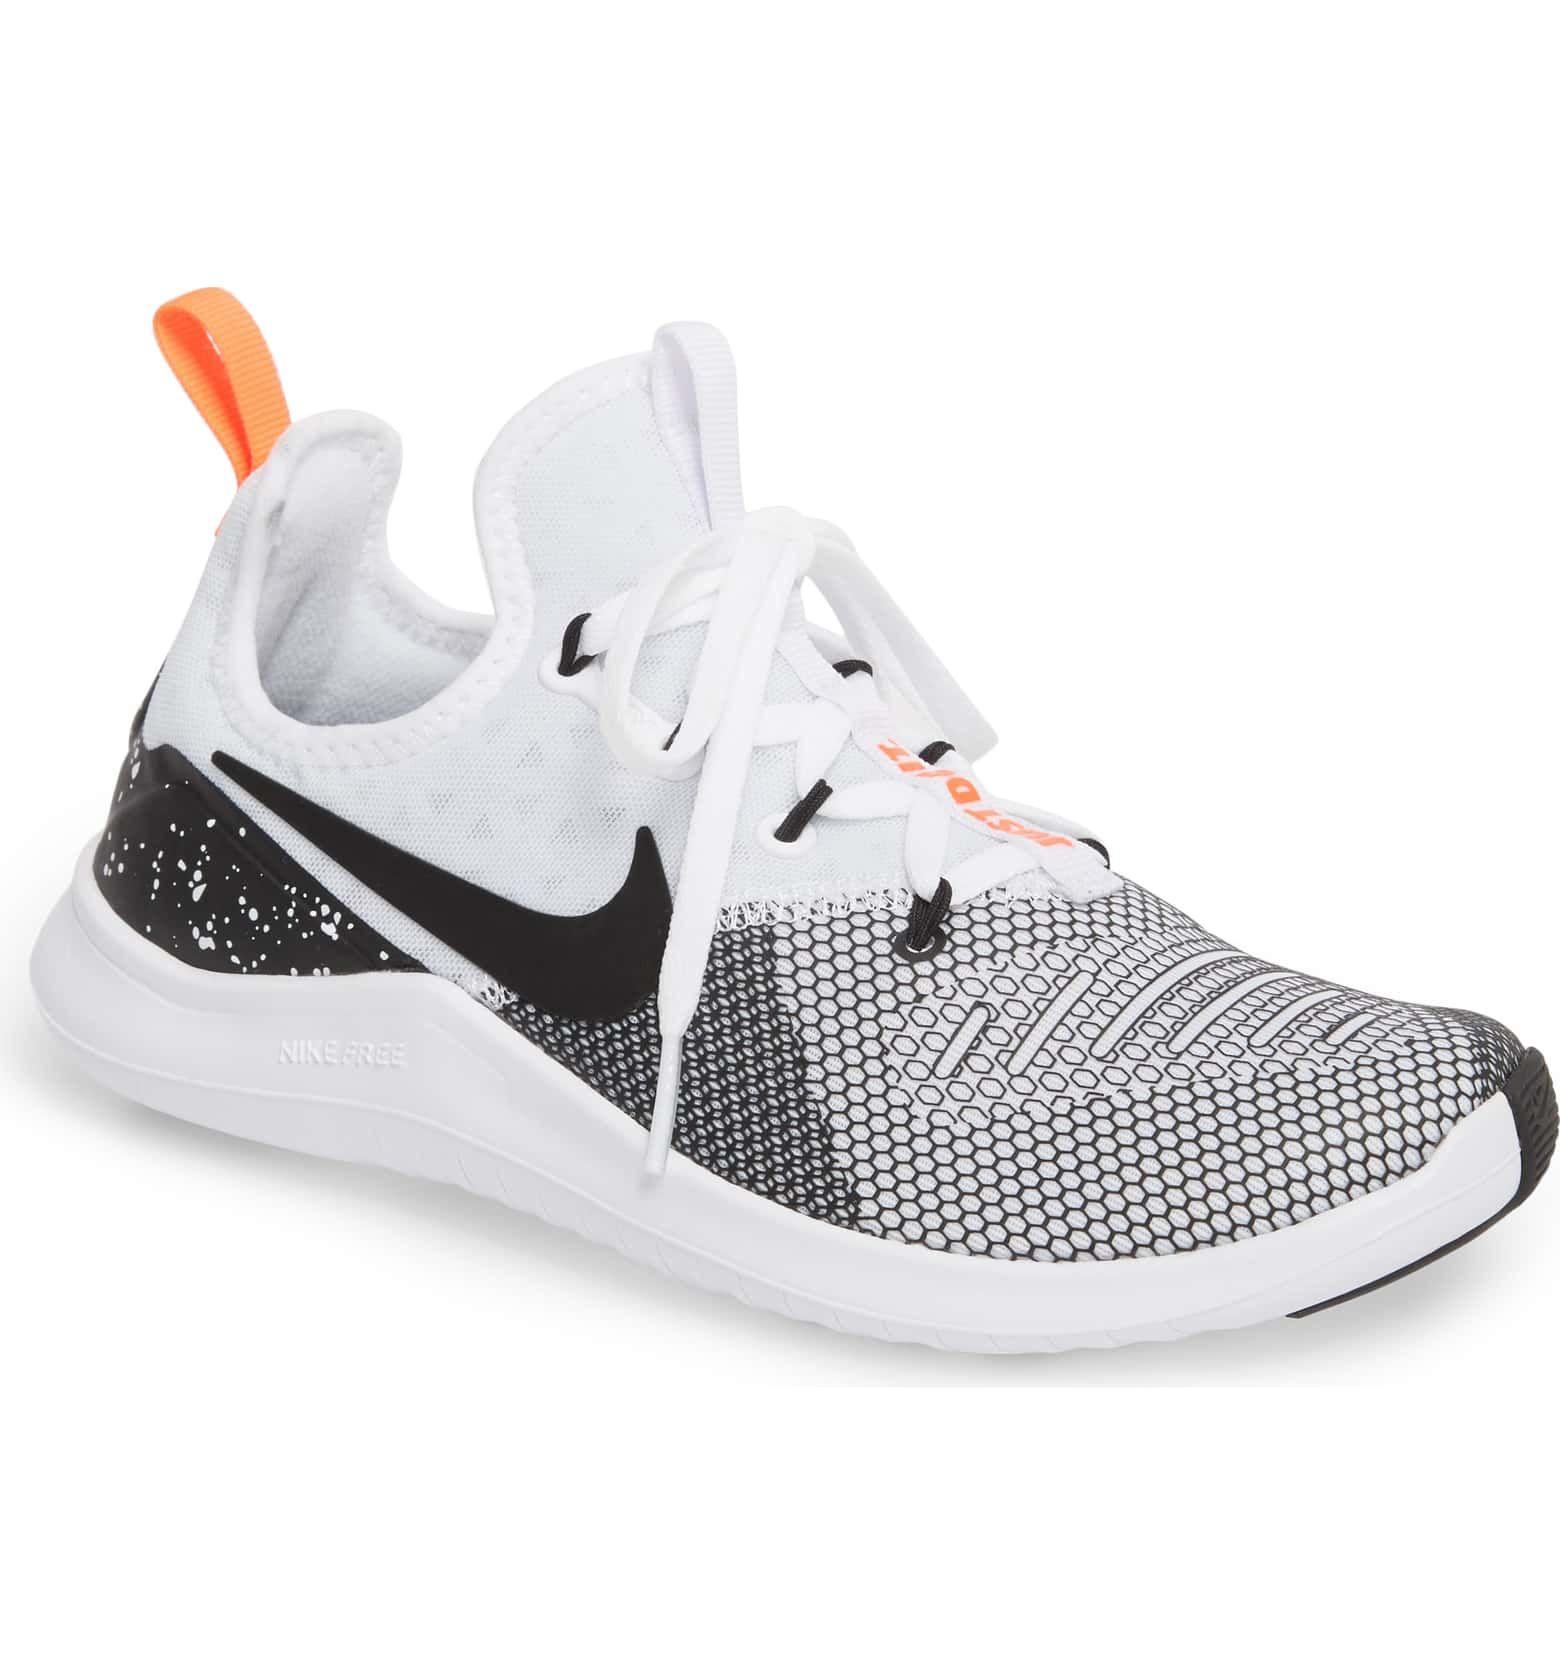 42c536f7026 Free TR8 Training Shoe